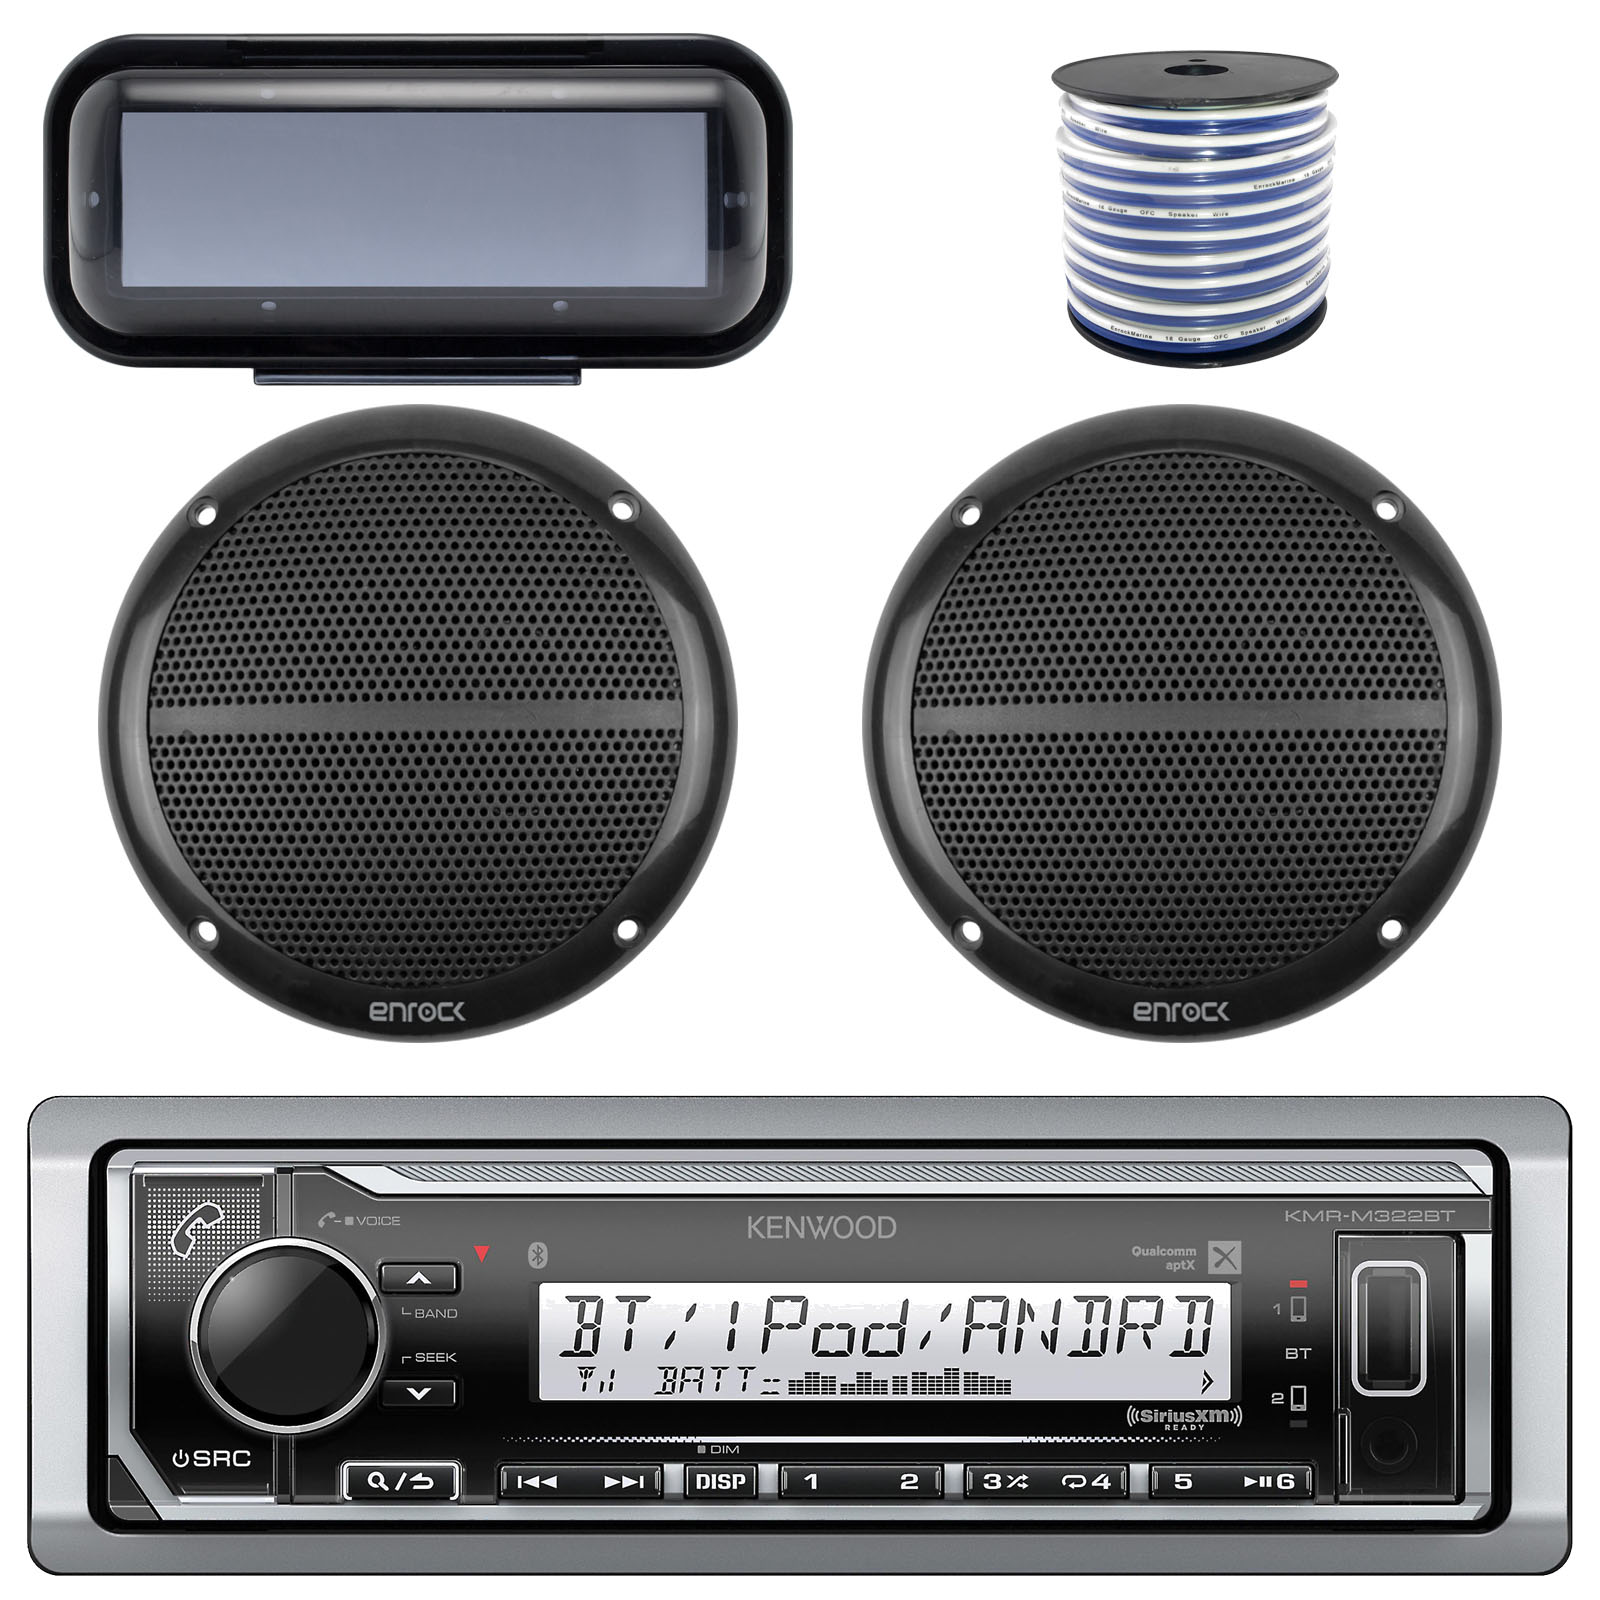 "Kenwood Marine Digital Media Bluetooth Receiver, 2x Millenia 6.5"" Outdoor Silver Speaker (Single), Enrock Marine Single Din Radio Dash Protector (Black), Marine 50 FT 16-G Tinned Speaker Wire"